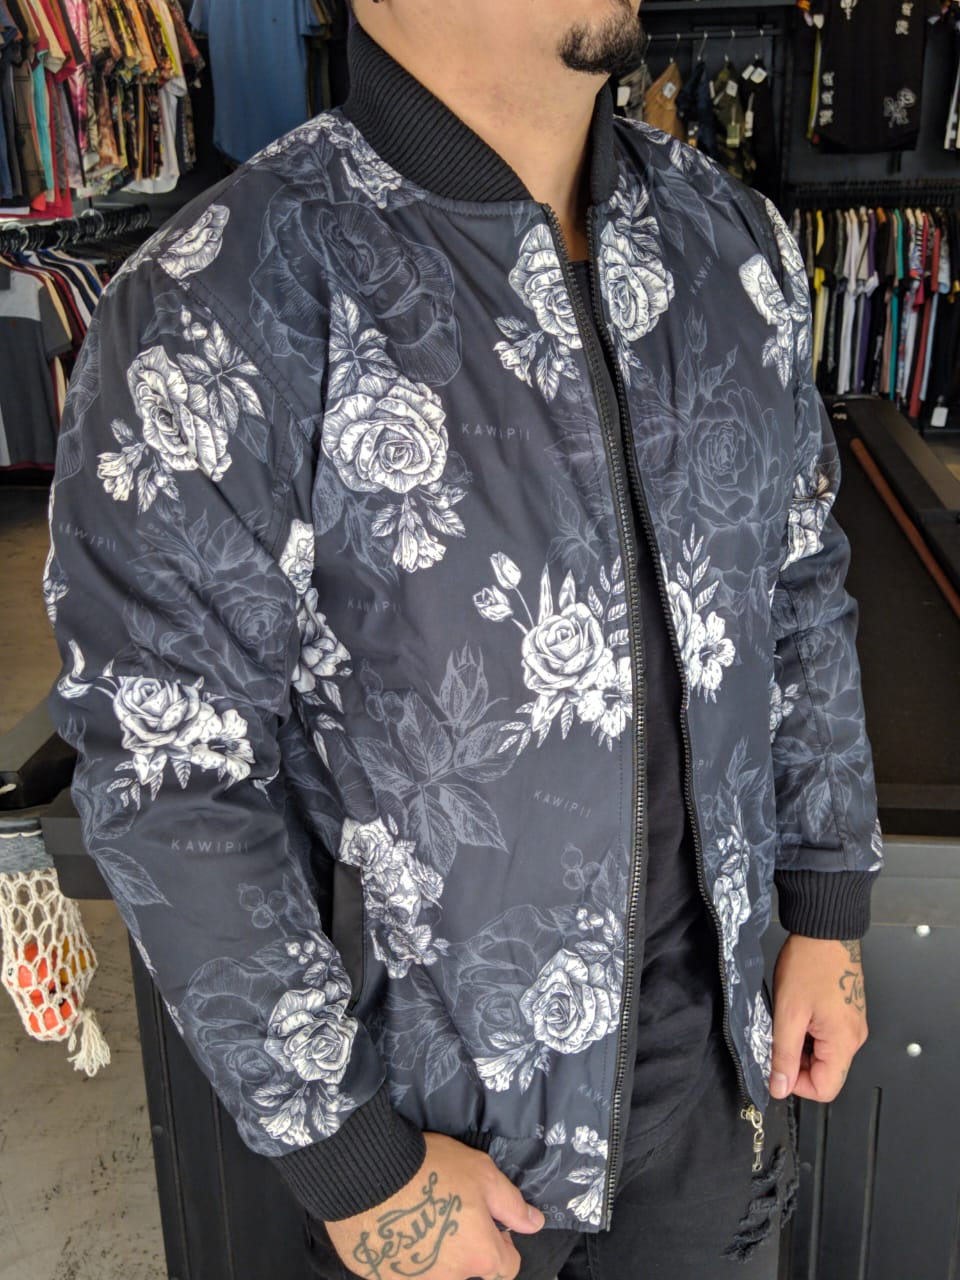 Jaqueta Bomber Kawippi Floral Preta  - Harpia Moda - Moda Masculina & Acessórios